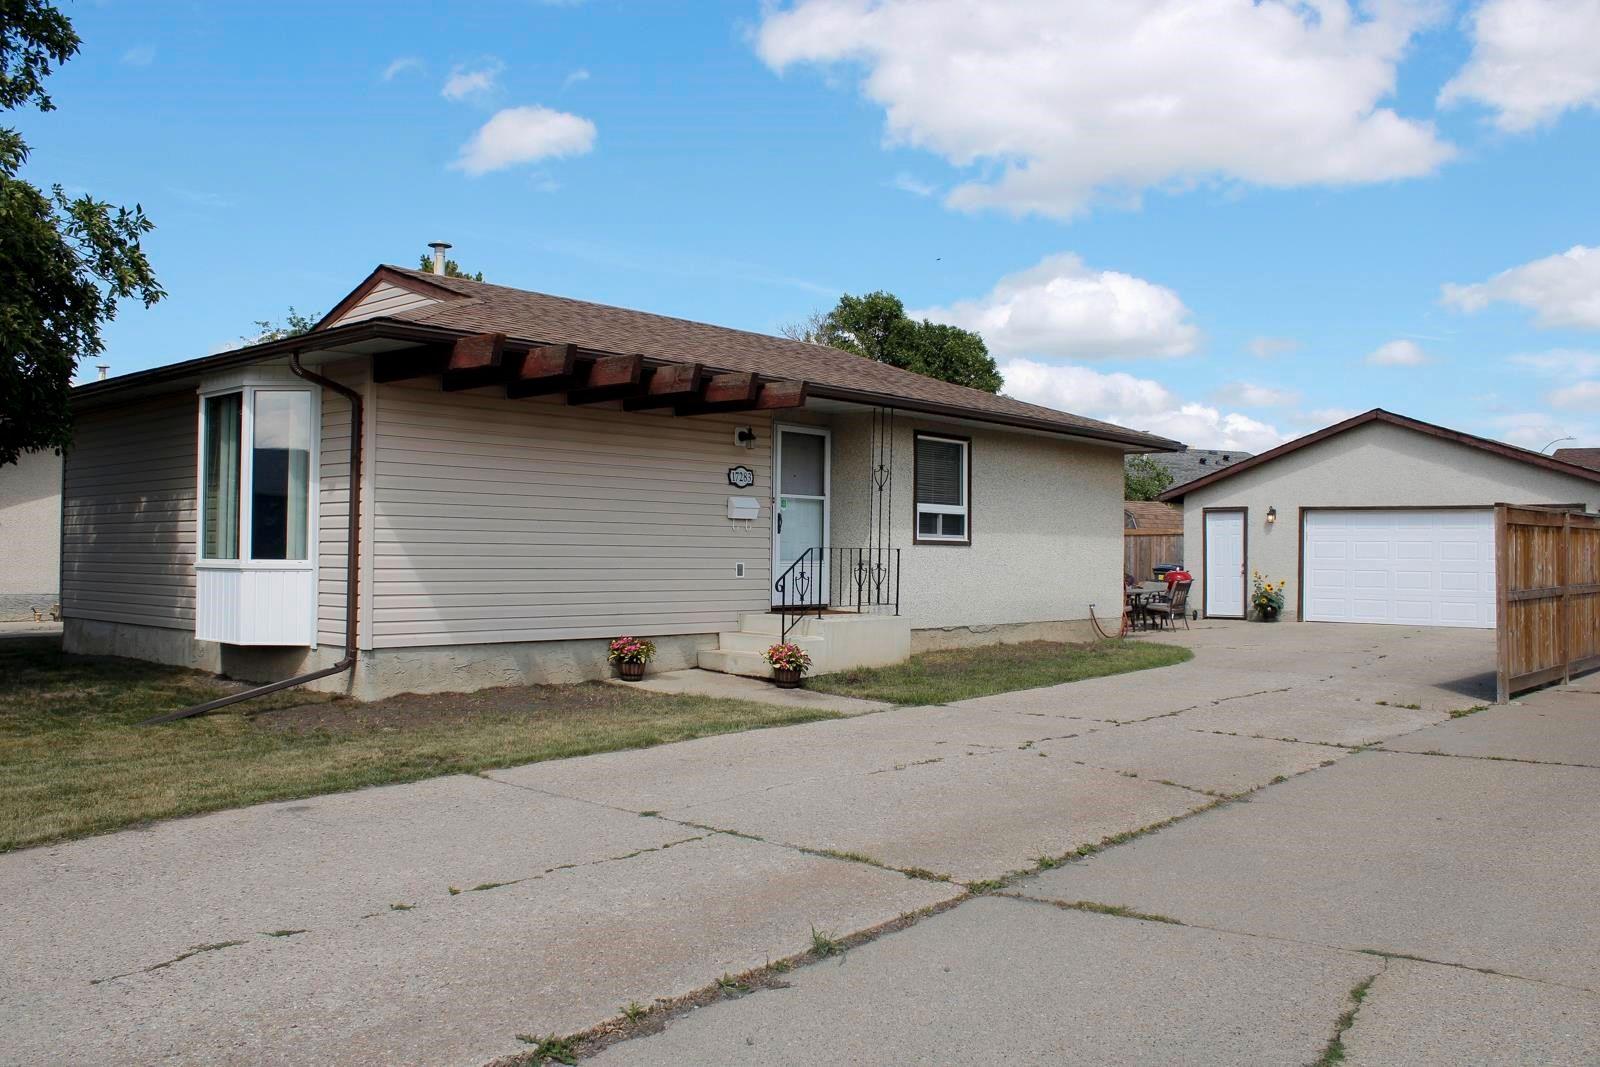 Main Photo: 17283 104 Street in Edmonton: Zone 27 House for sale : MLS®# E4253302